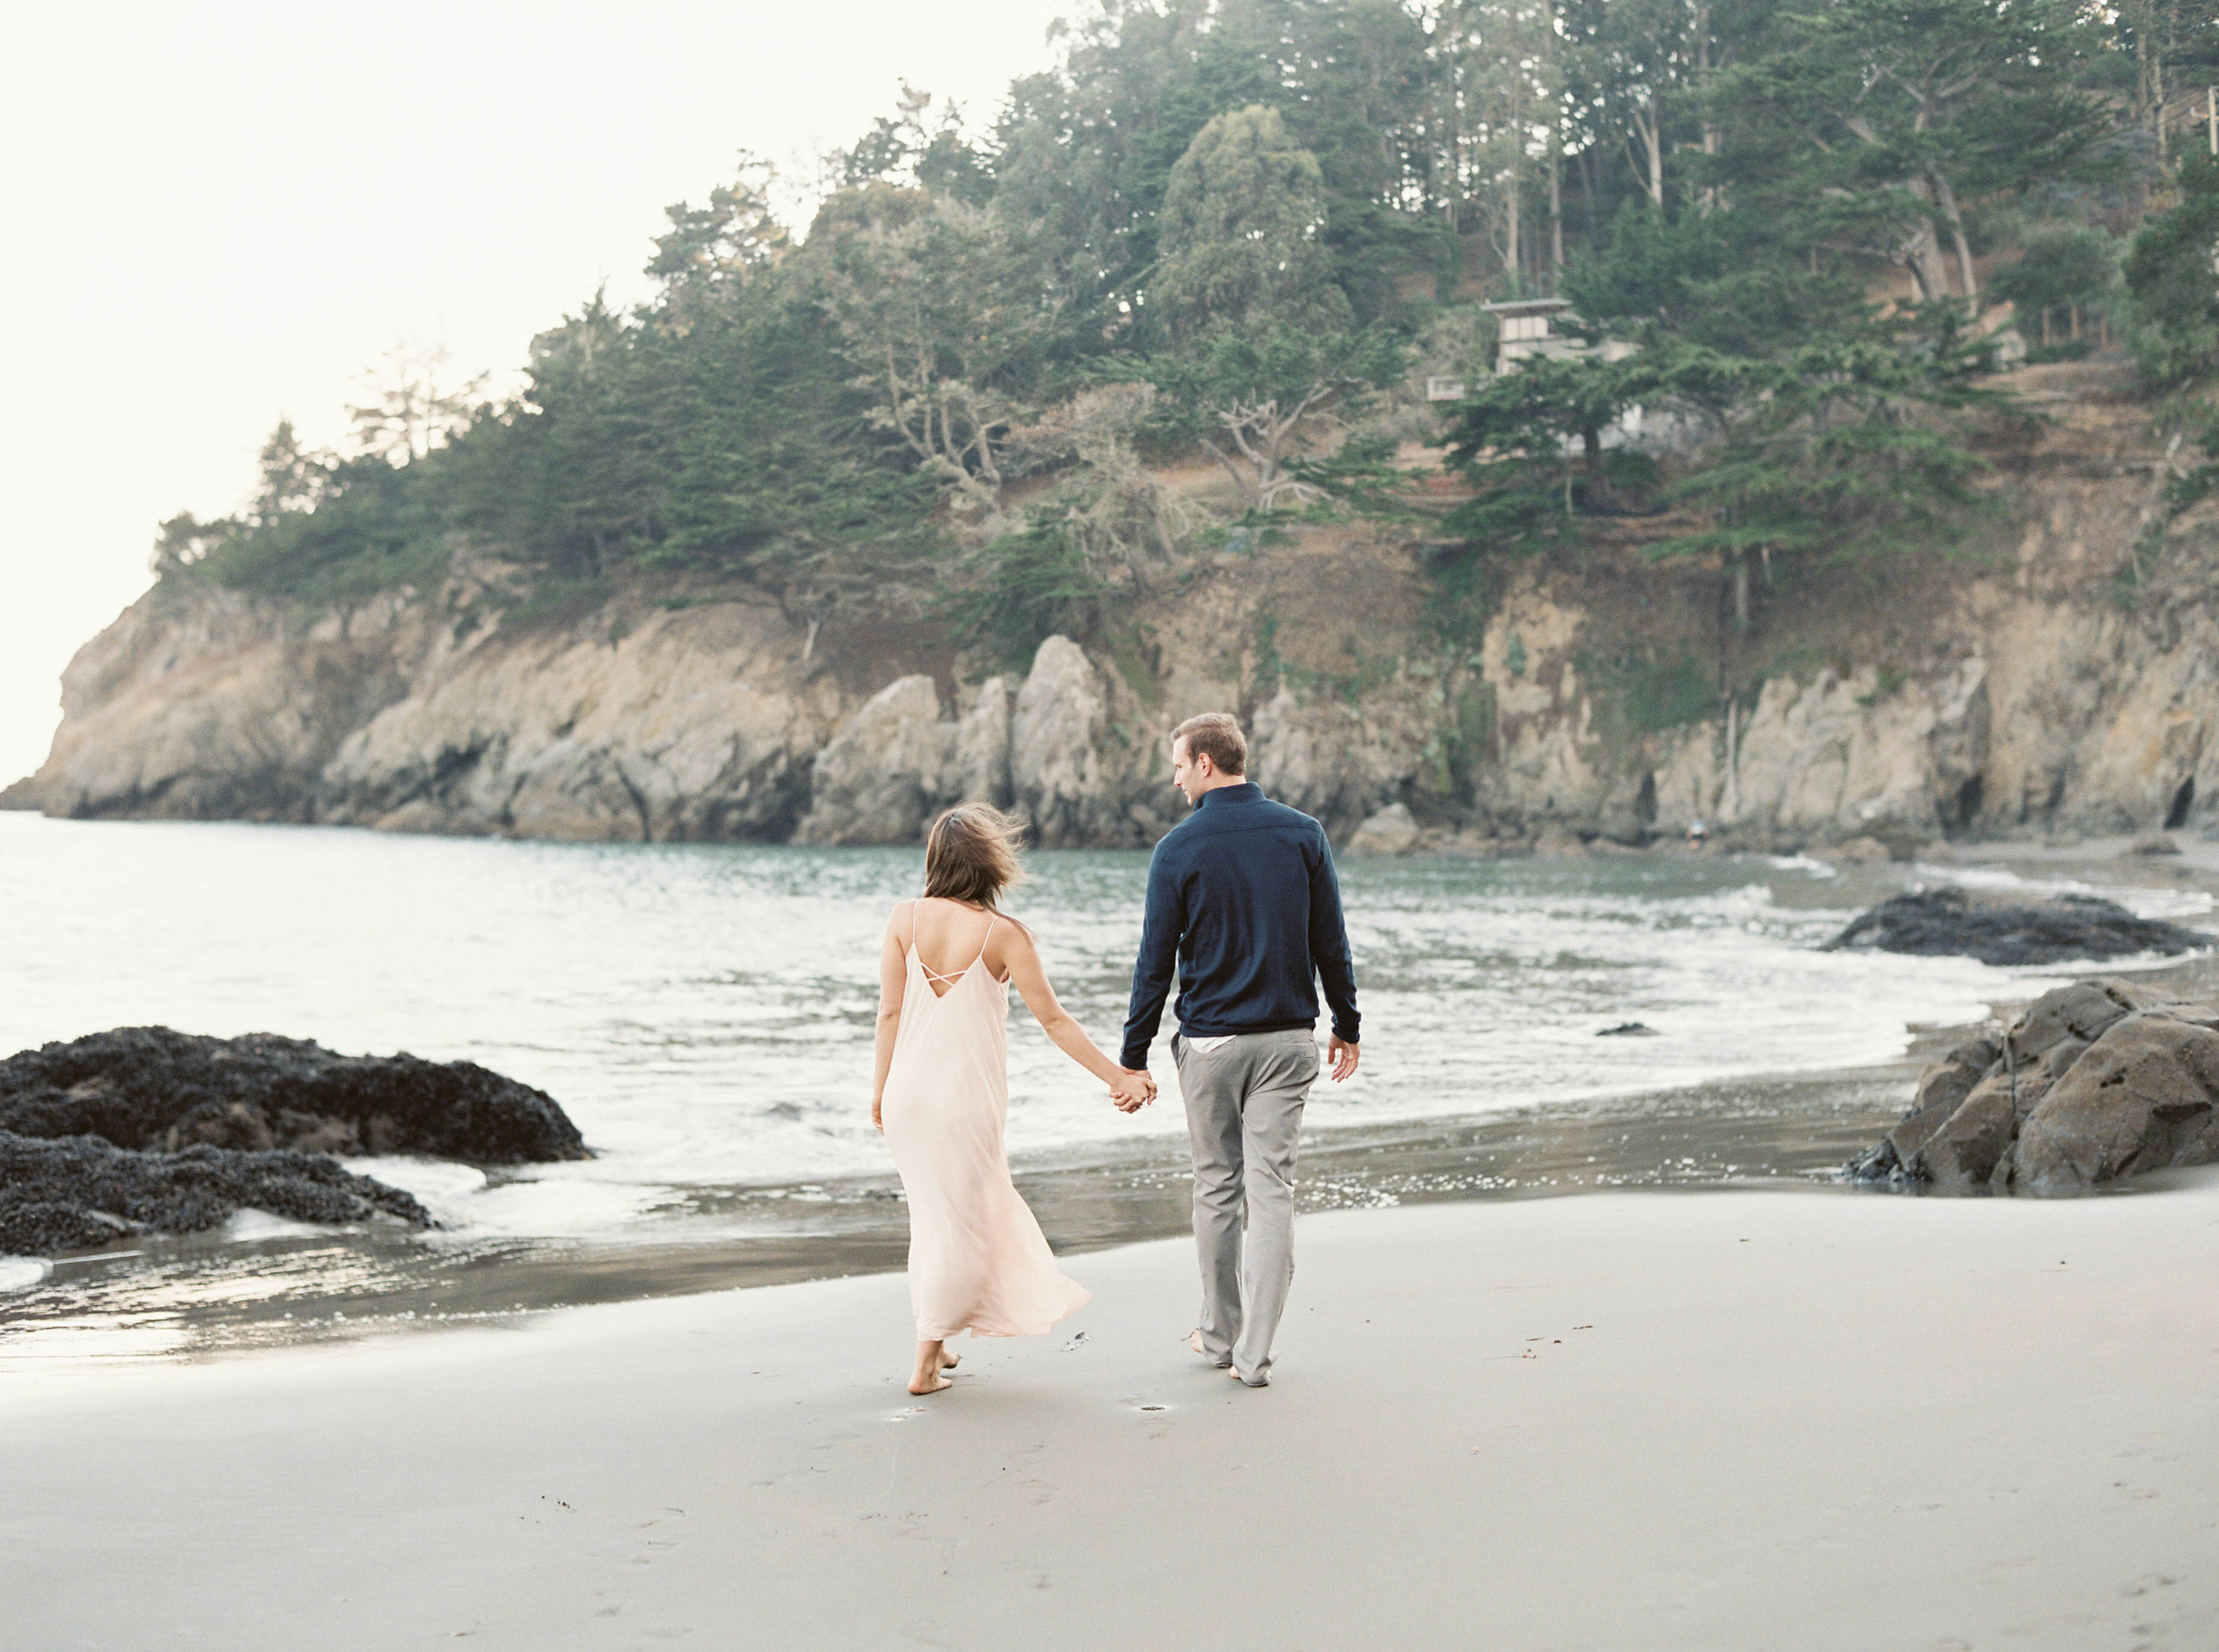 Meghan Mehan Photography - Fine Art Film Wedding Photography - San Francisco | Napa | Sonoma | Big Sur | Santa Barbara - 114.jpg